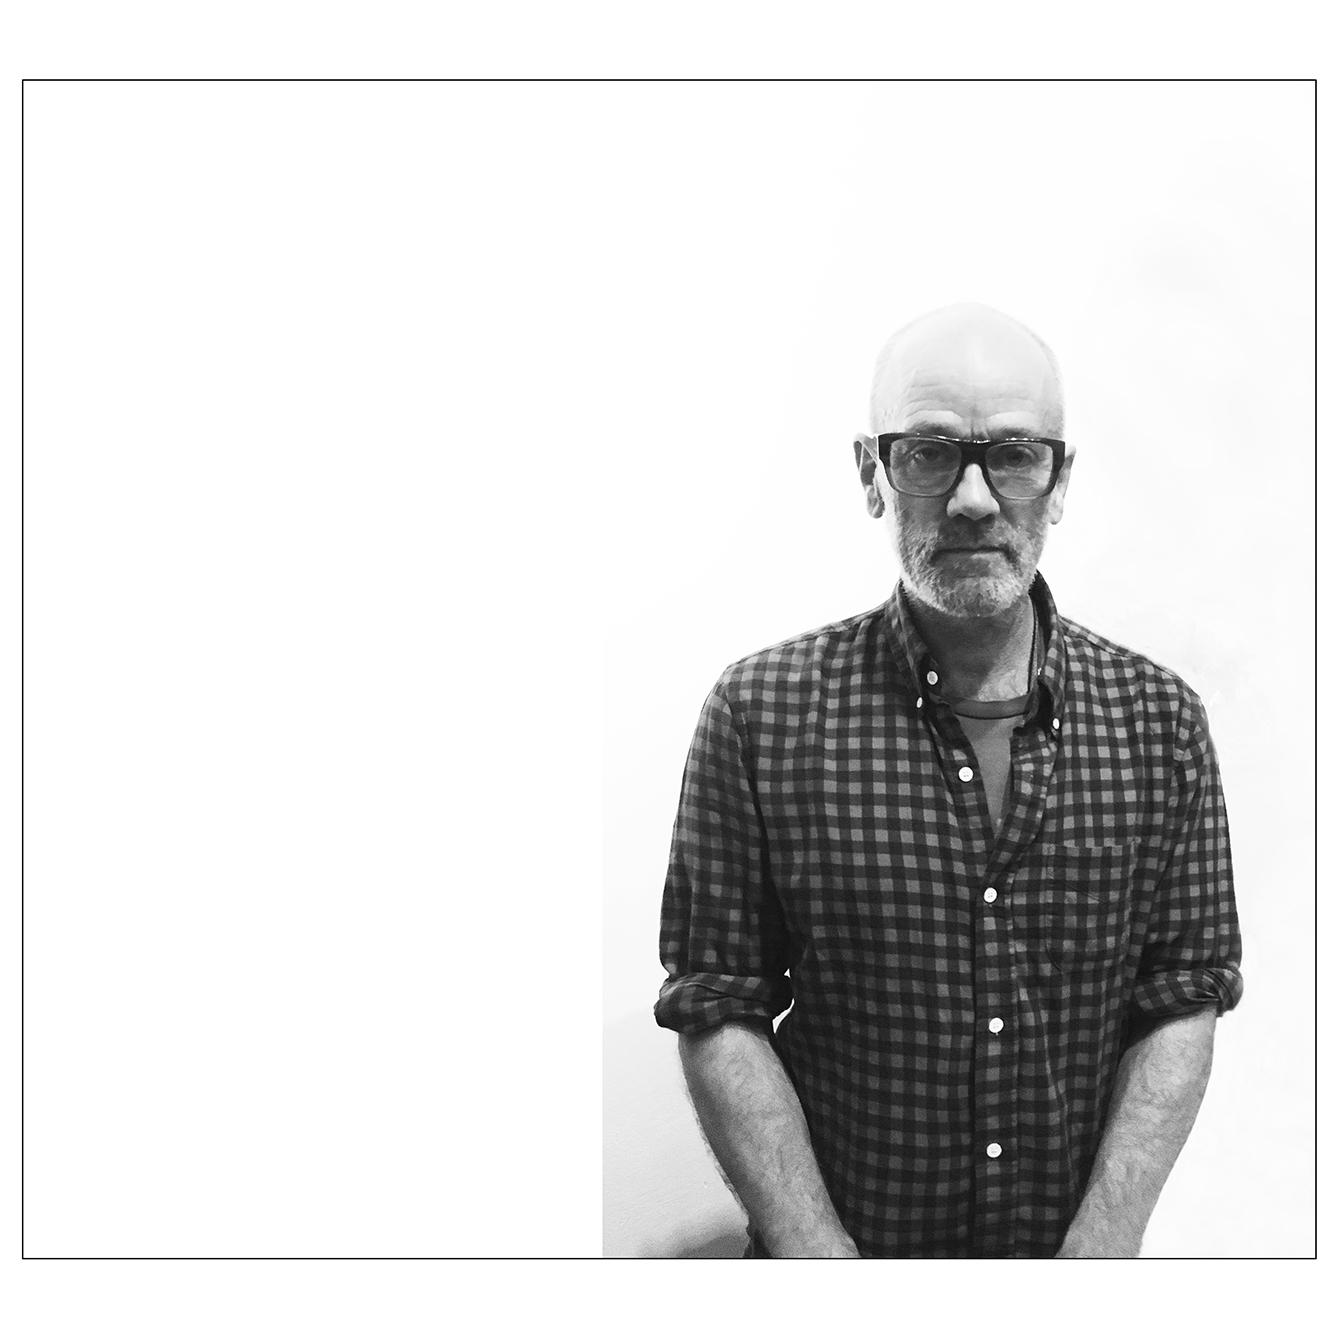 Arts & Books with Michael Stipe in Berlin